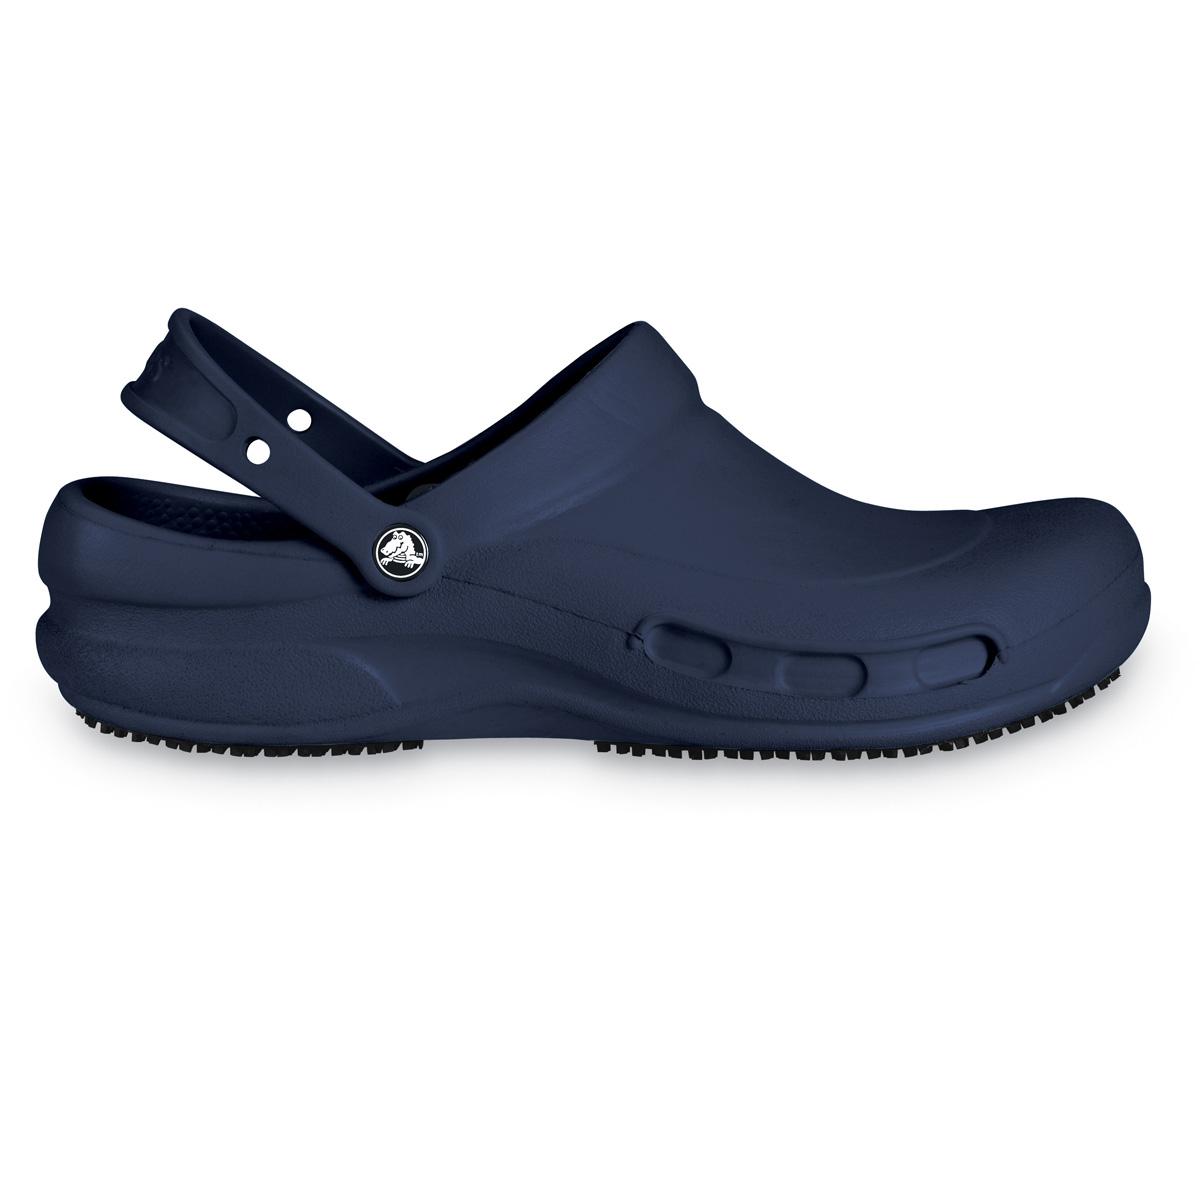 Crocs Bistro - Lacivert